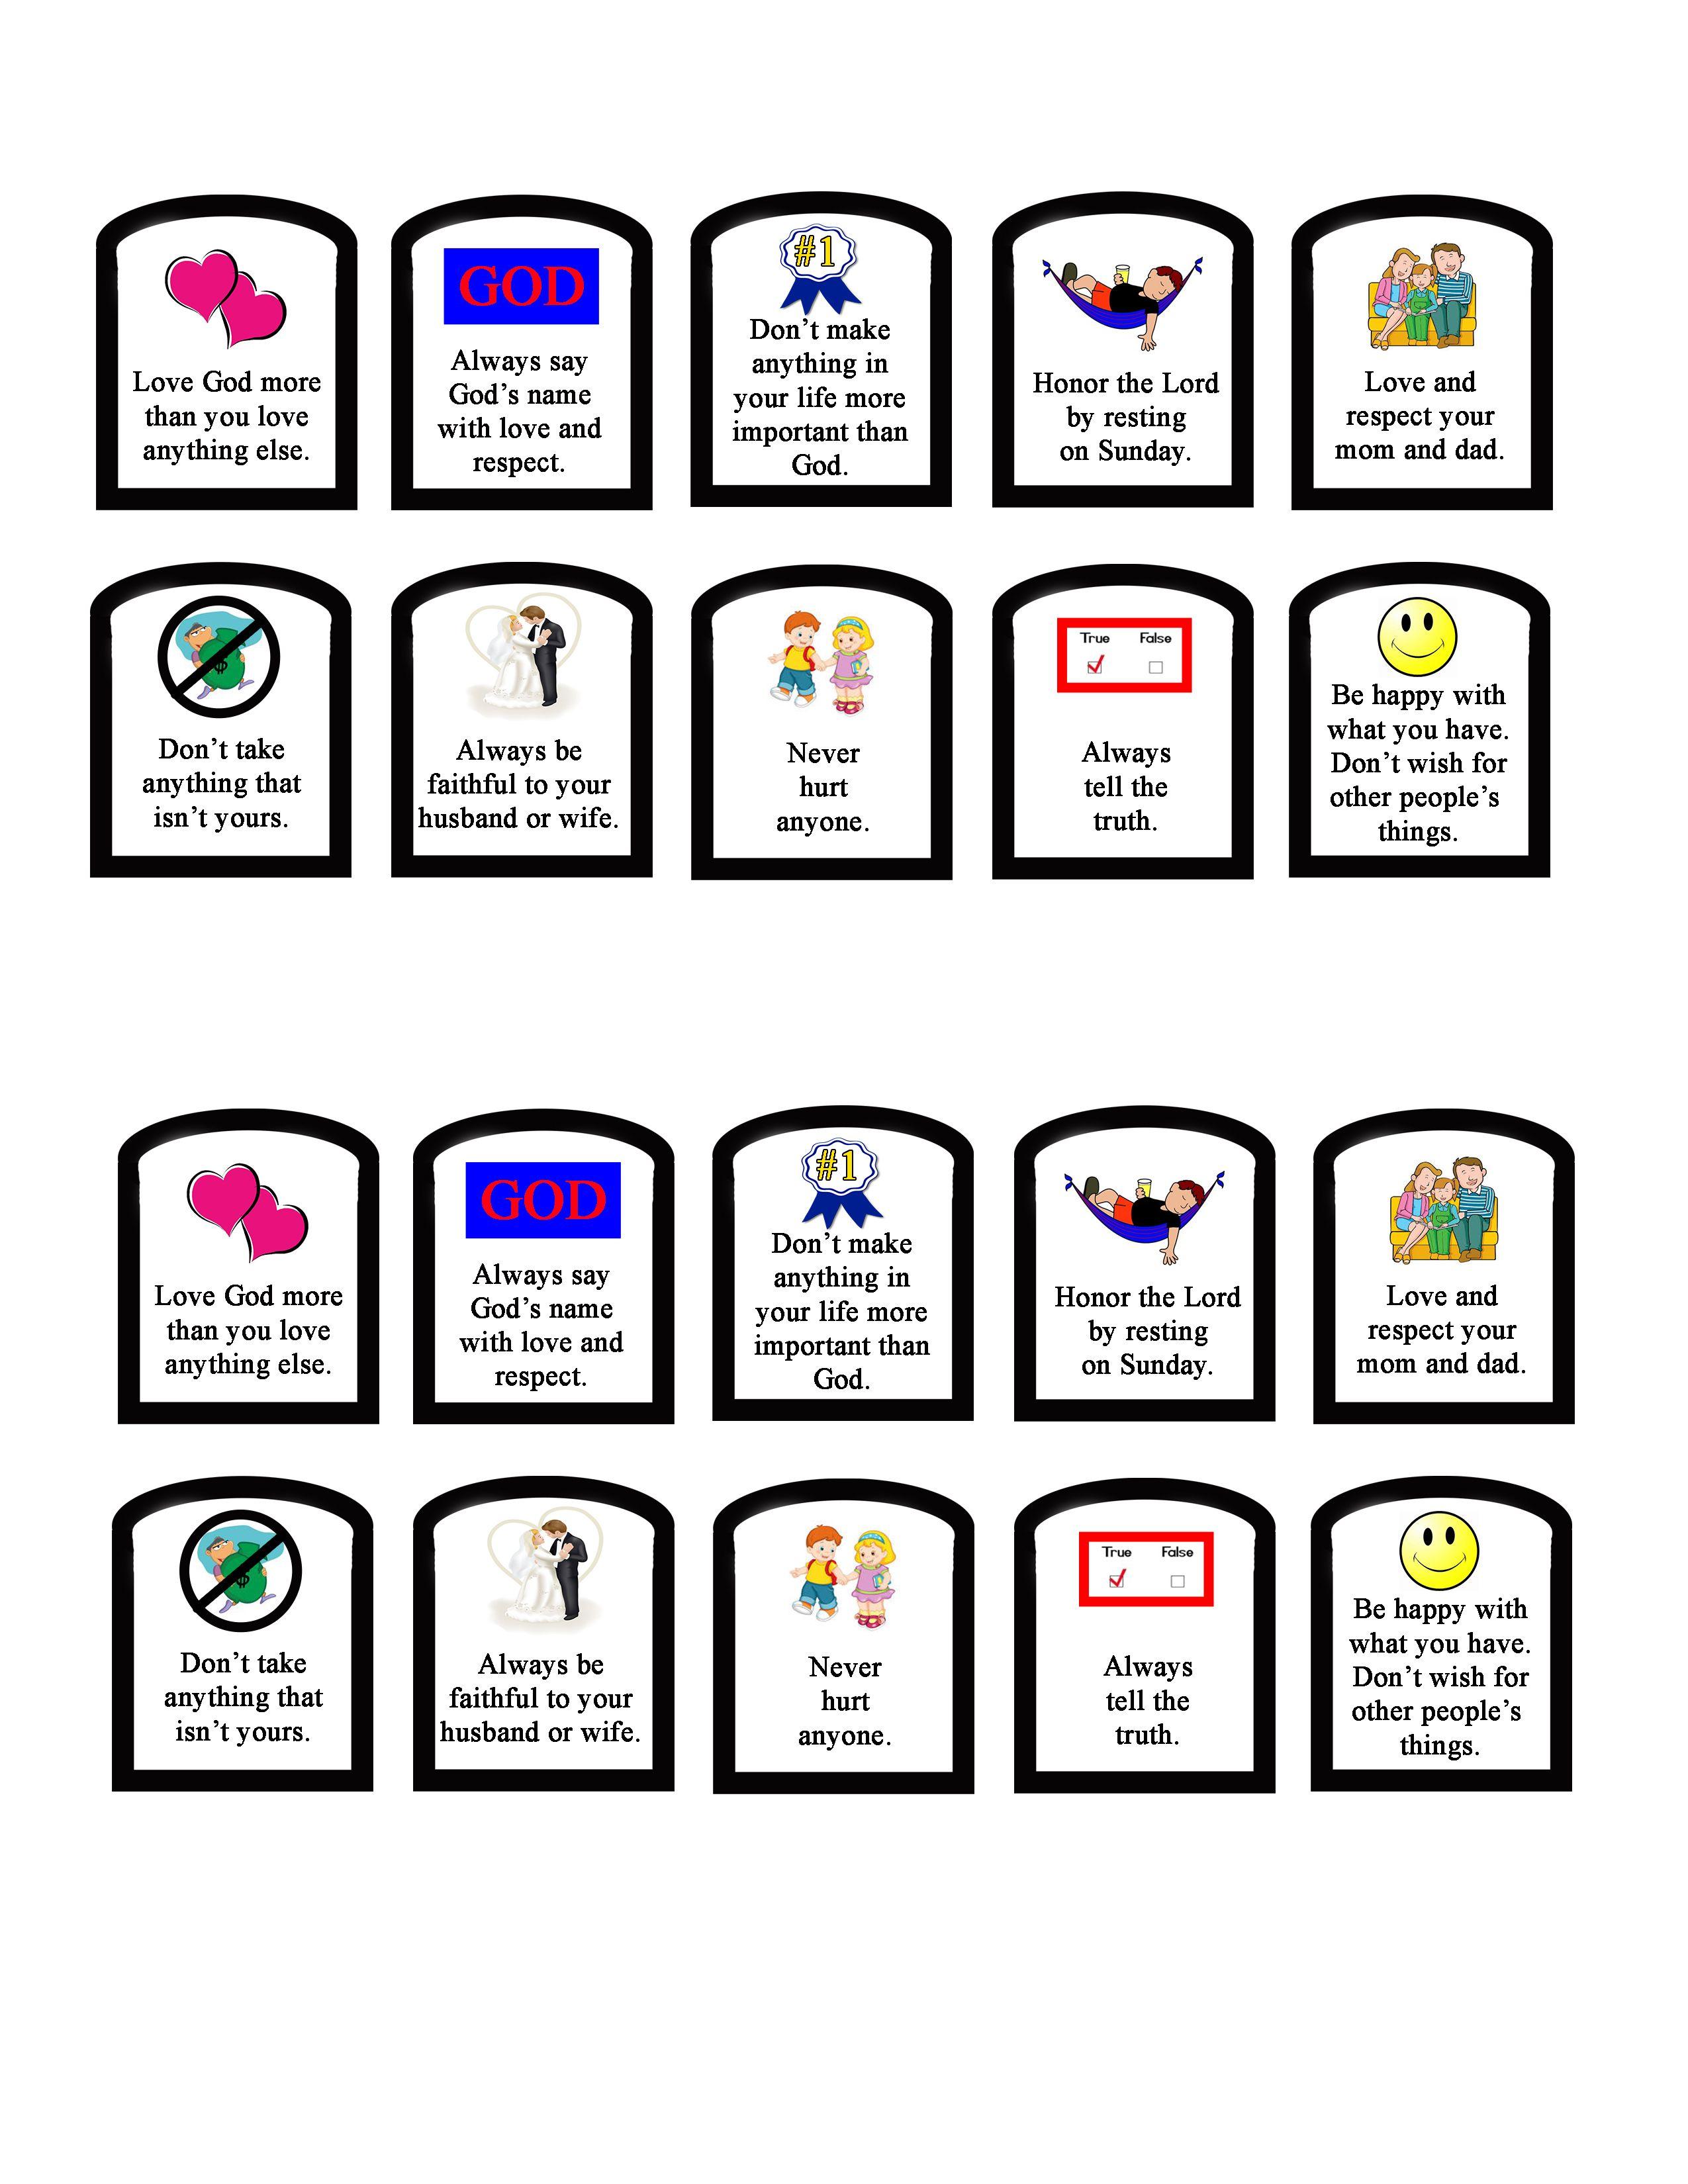 10 commandments sunday school pinterest sunday school sunday